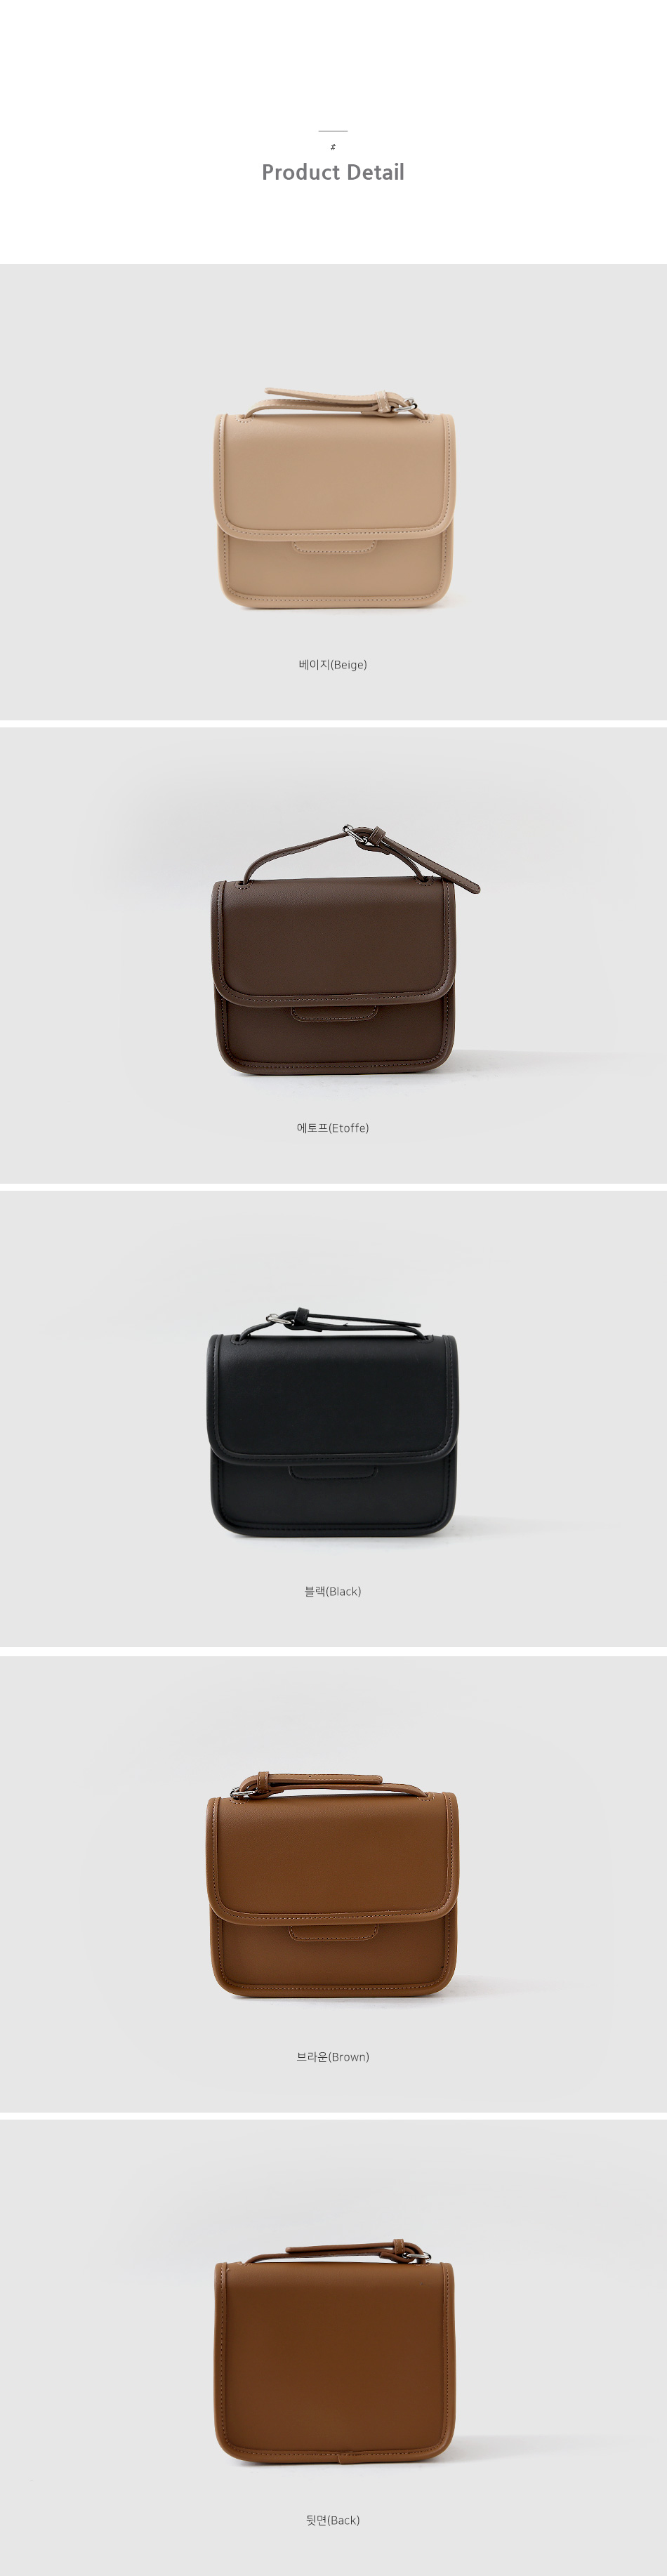 Forben Cross Bag